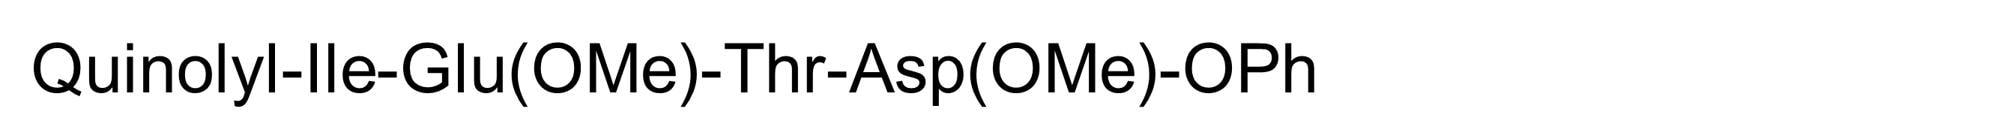 Chemical Structure - Q-IETD-OPh, caspase-8 inhibitor (ab142038)